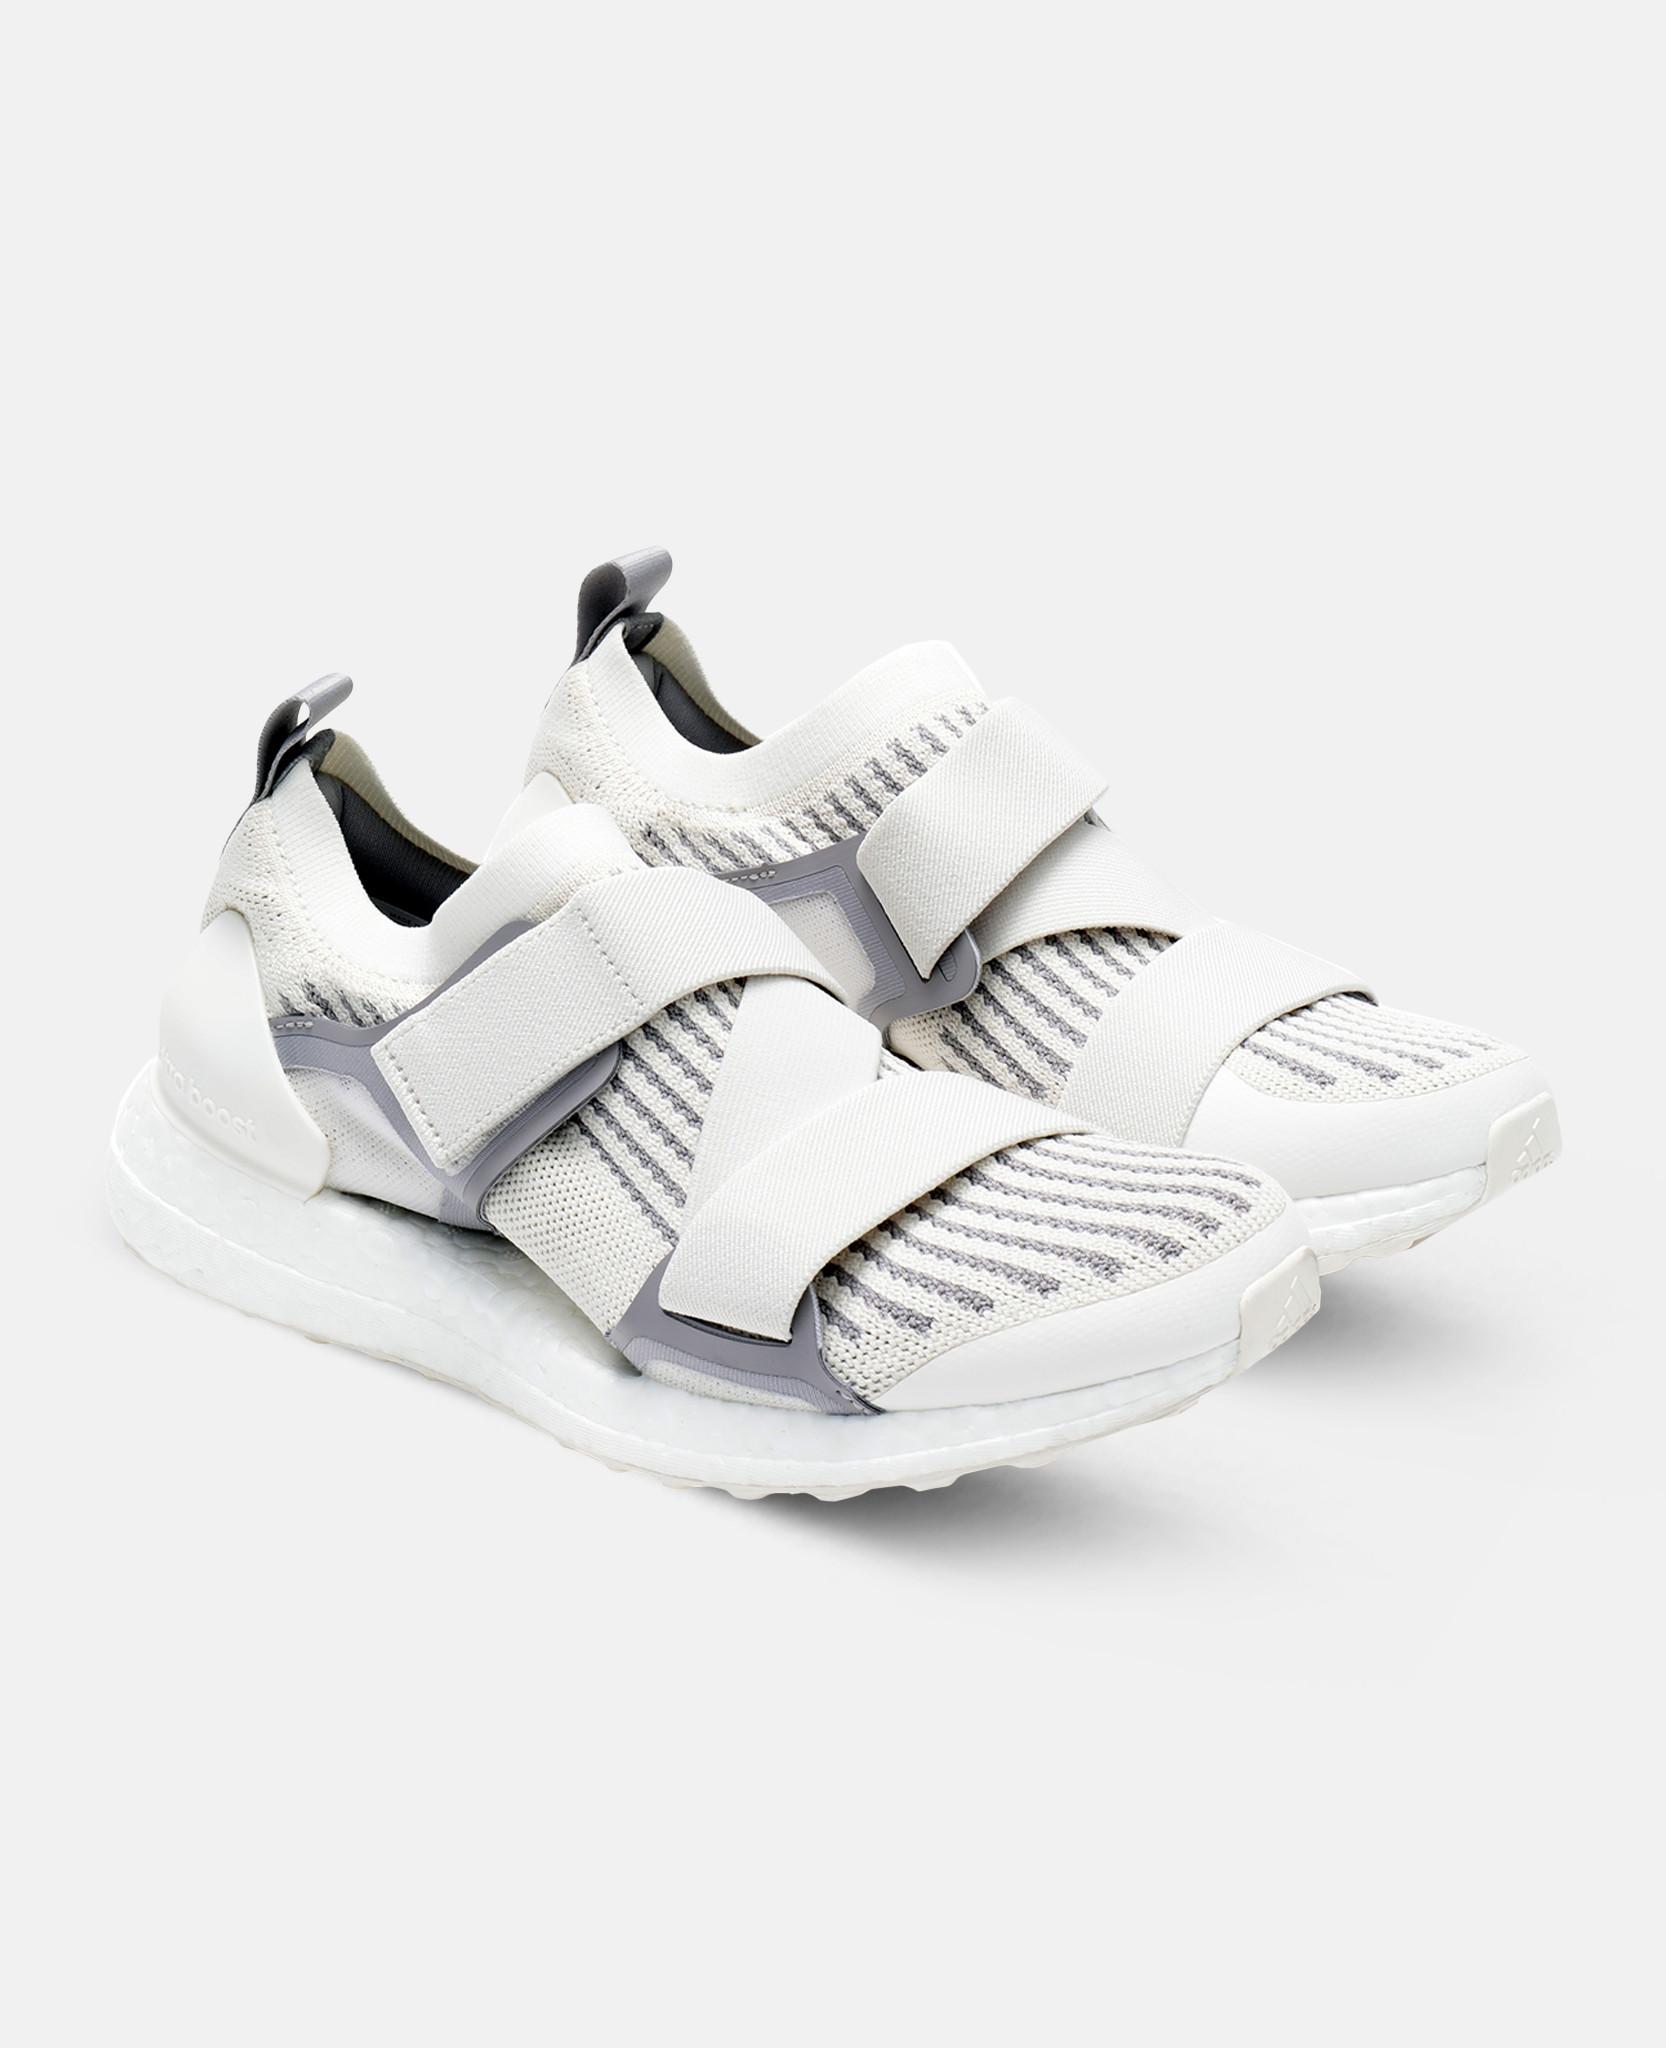 40d21f116be5f Adidas By Stella McCartney Gray Ultraboost X 3d Sneakers